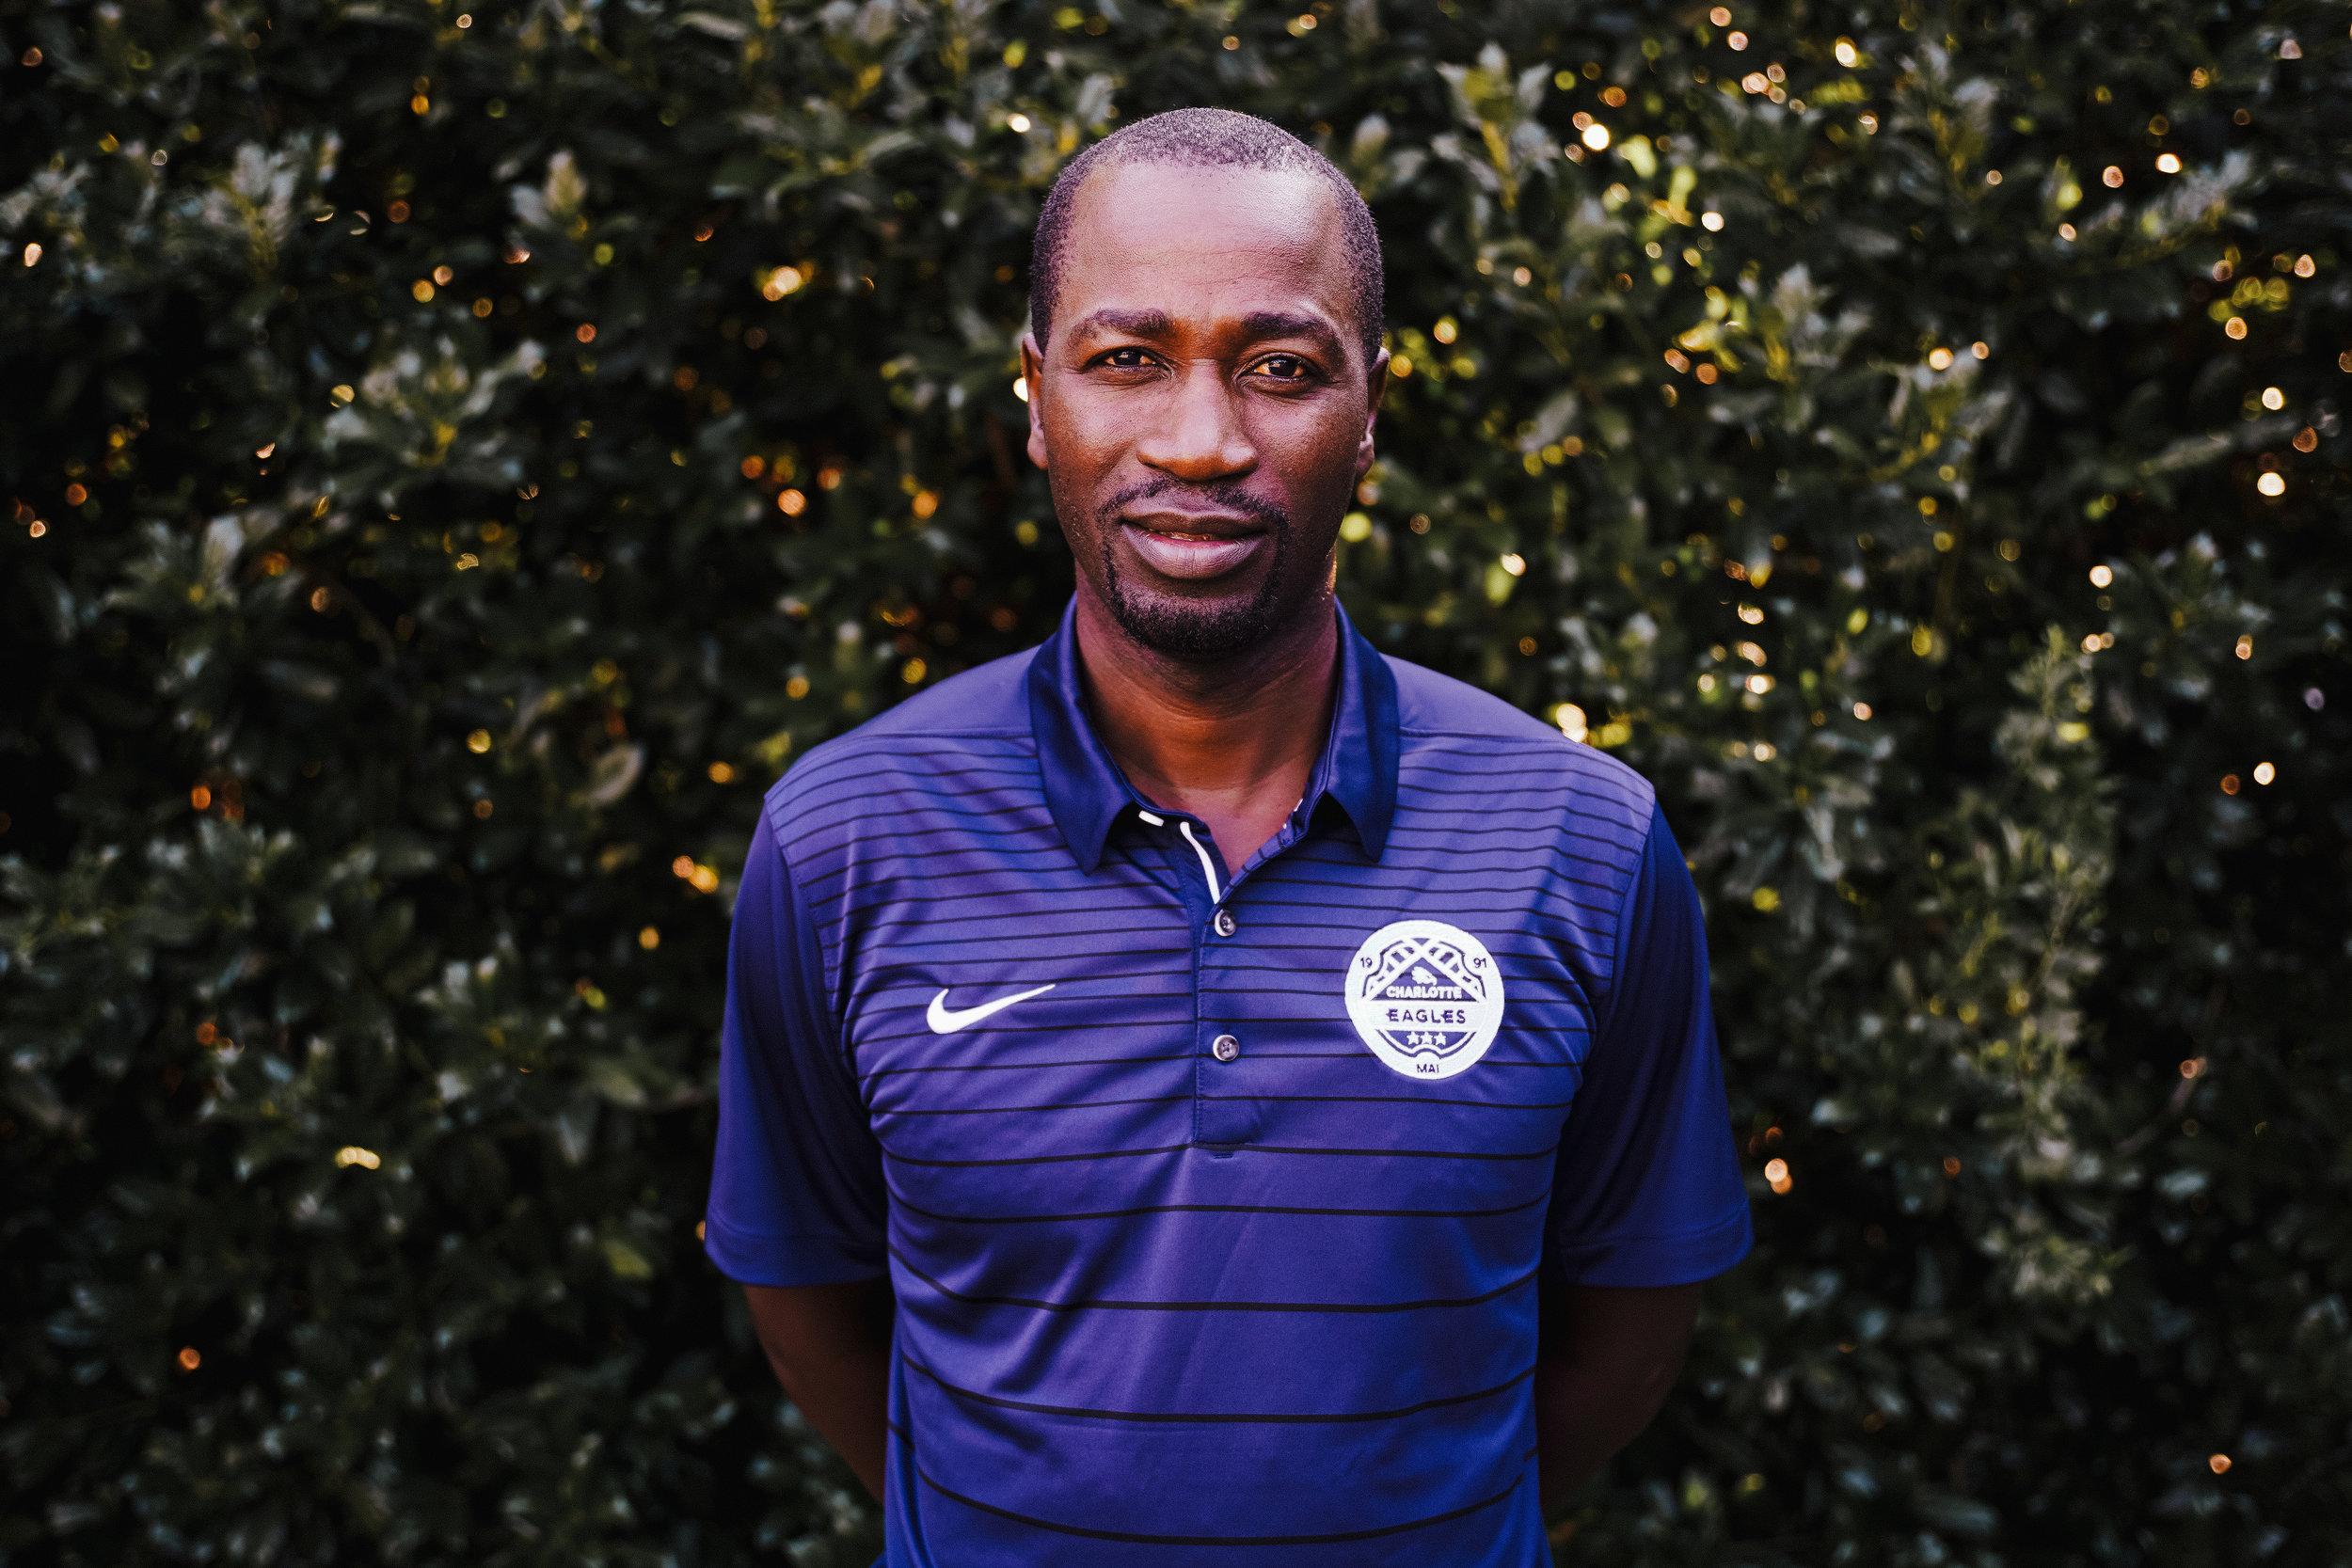 Joseph Kabwe